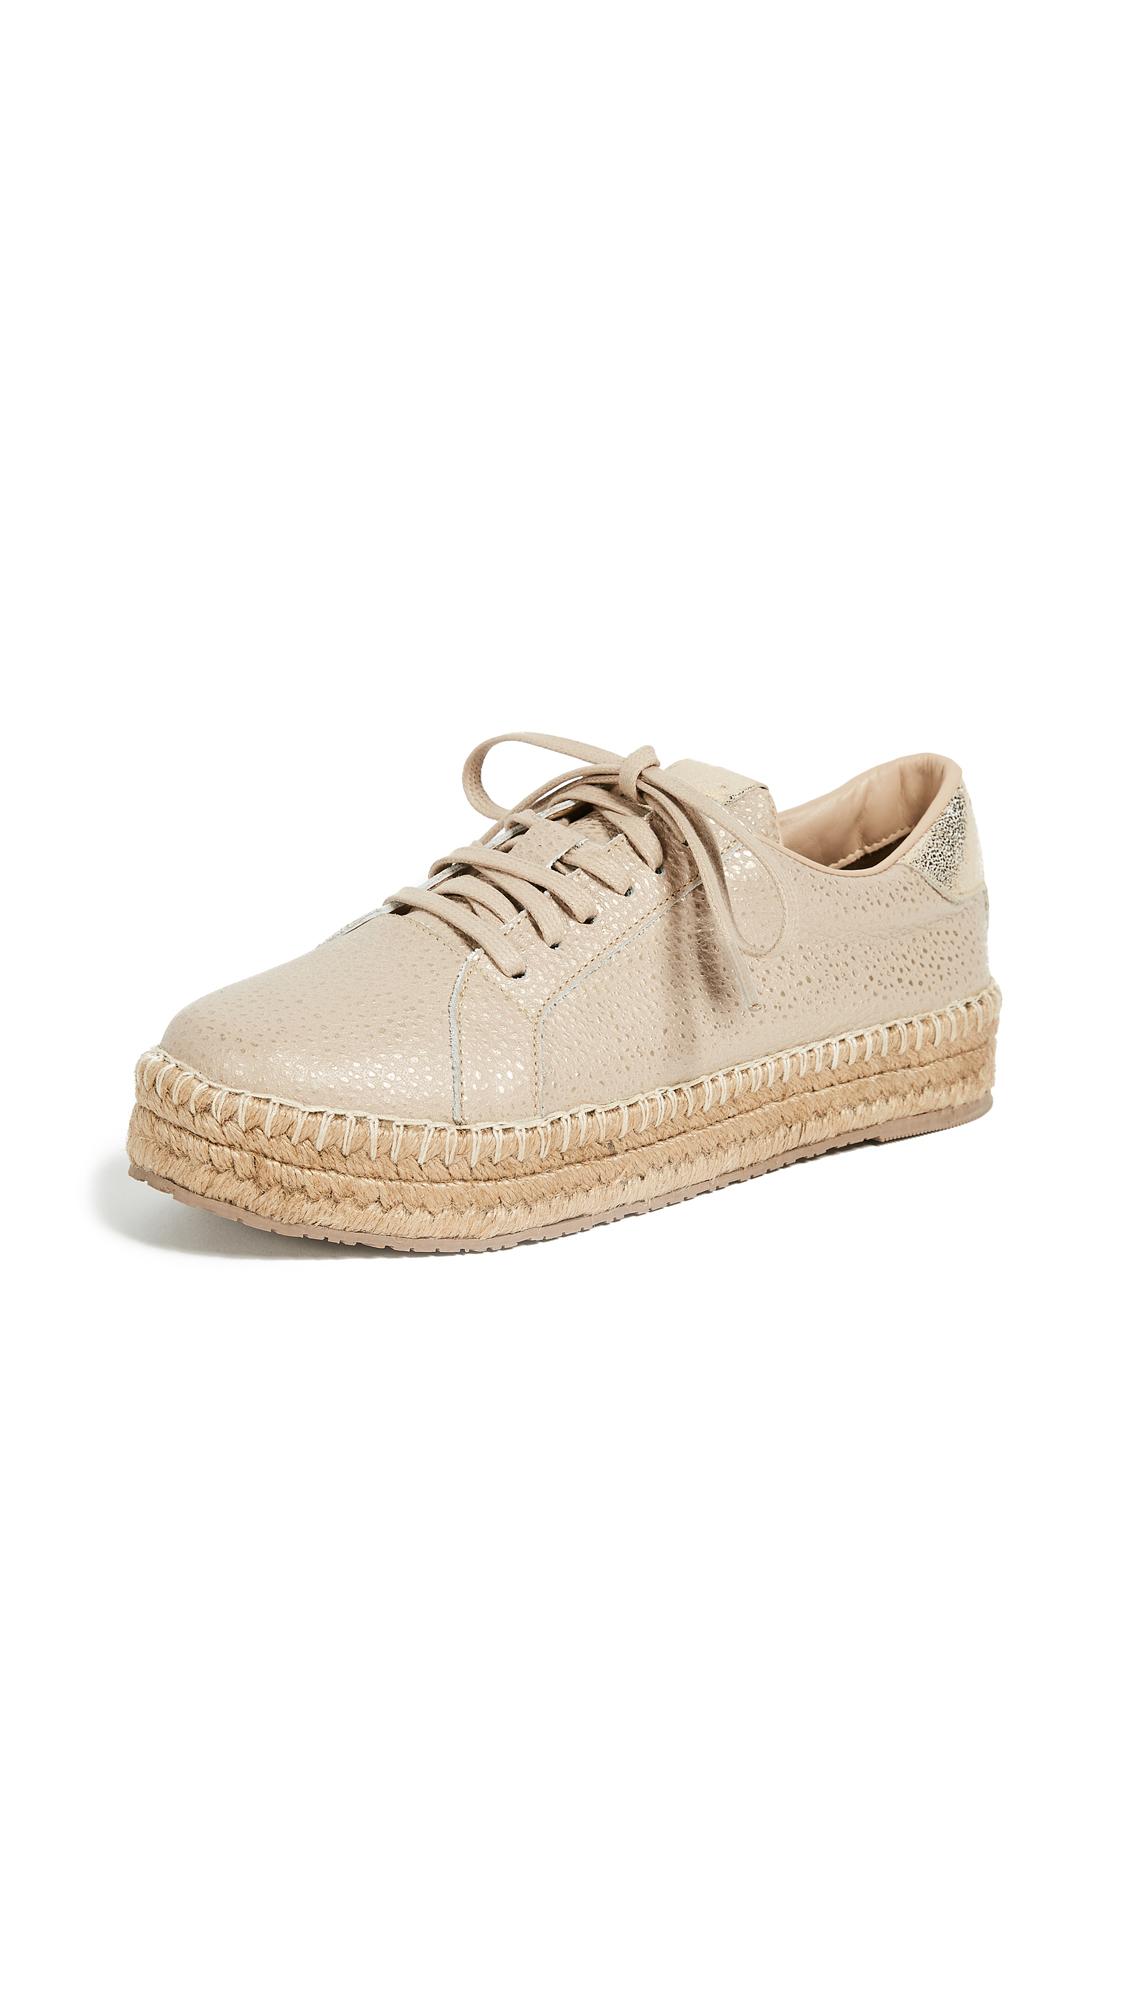 KAANAS Arizona Sneaker Espadrilles - Cappuccino